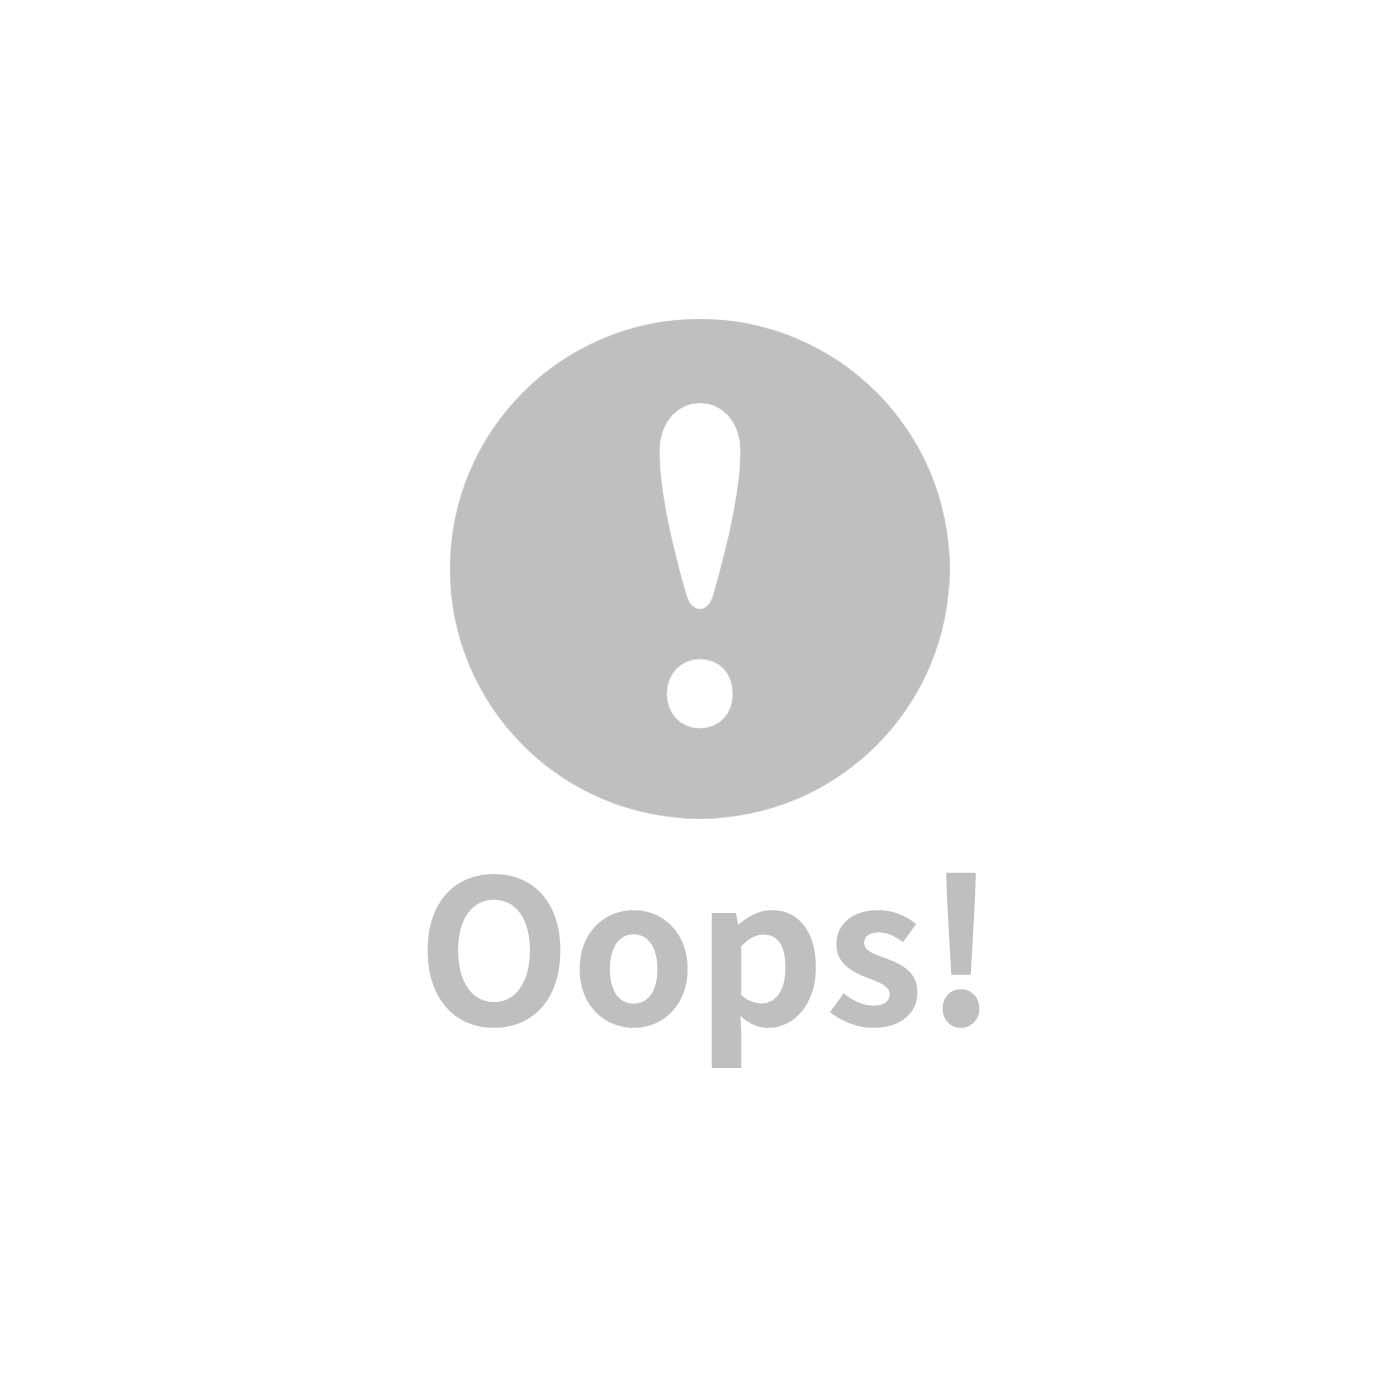 La Millou Moonies頂級羊皮膠底學步鞋禮盒11-18m_魔鬼氈款(葡萄)